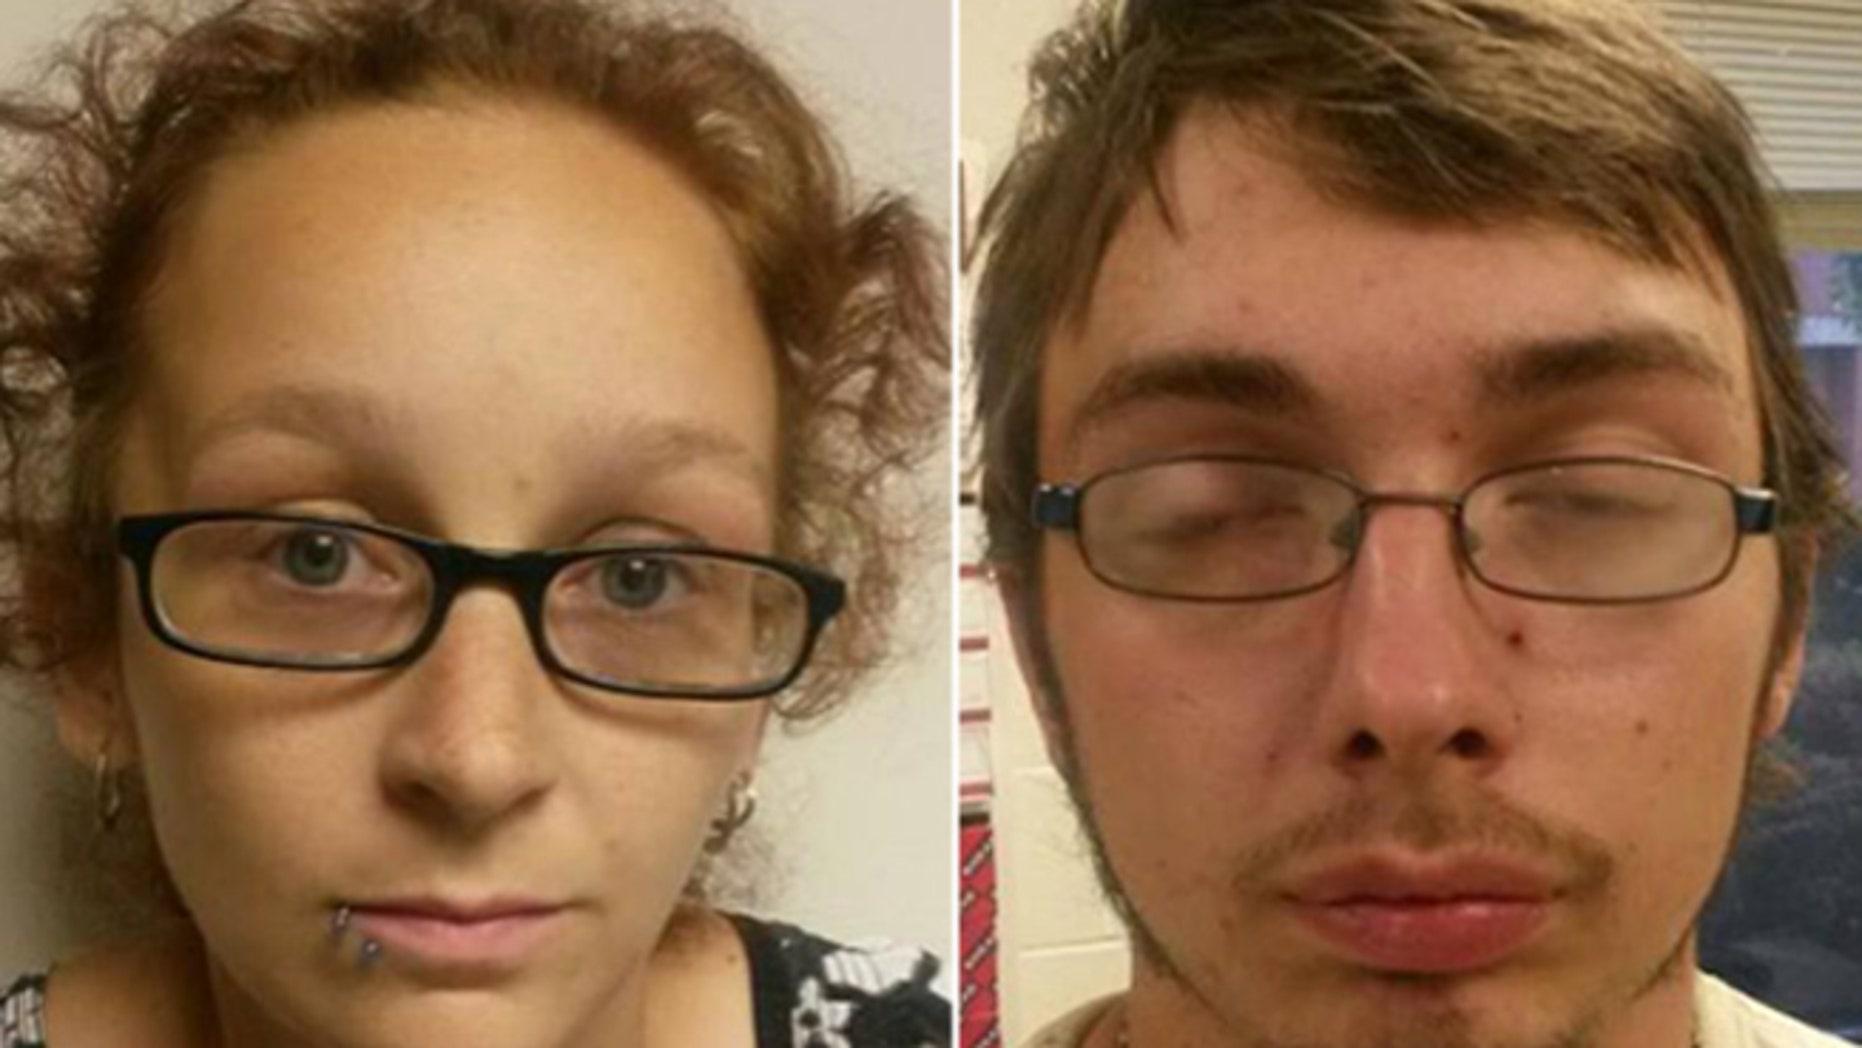 Mug shots of Ashely Harmon and Jonathan Flint. (Fayette County Sheriff's Office)